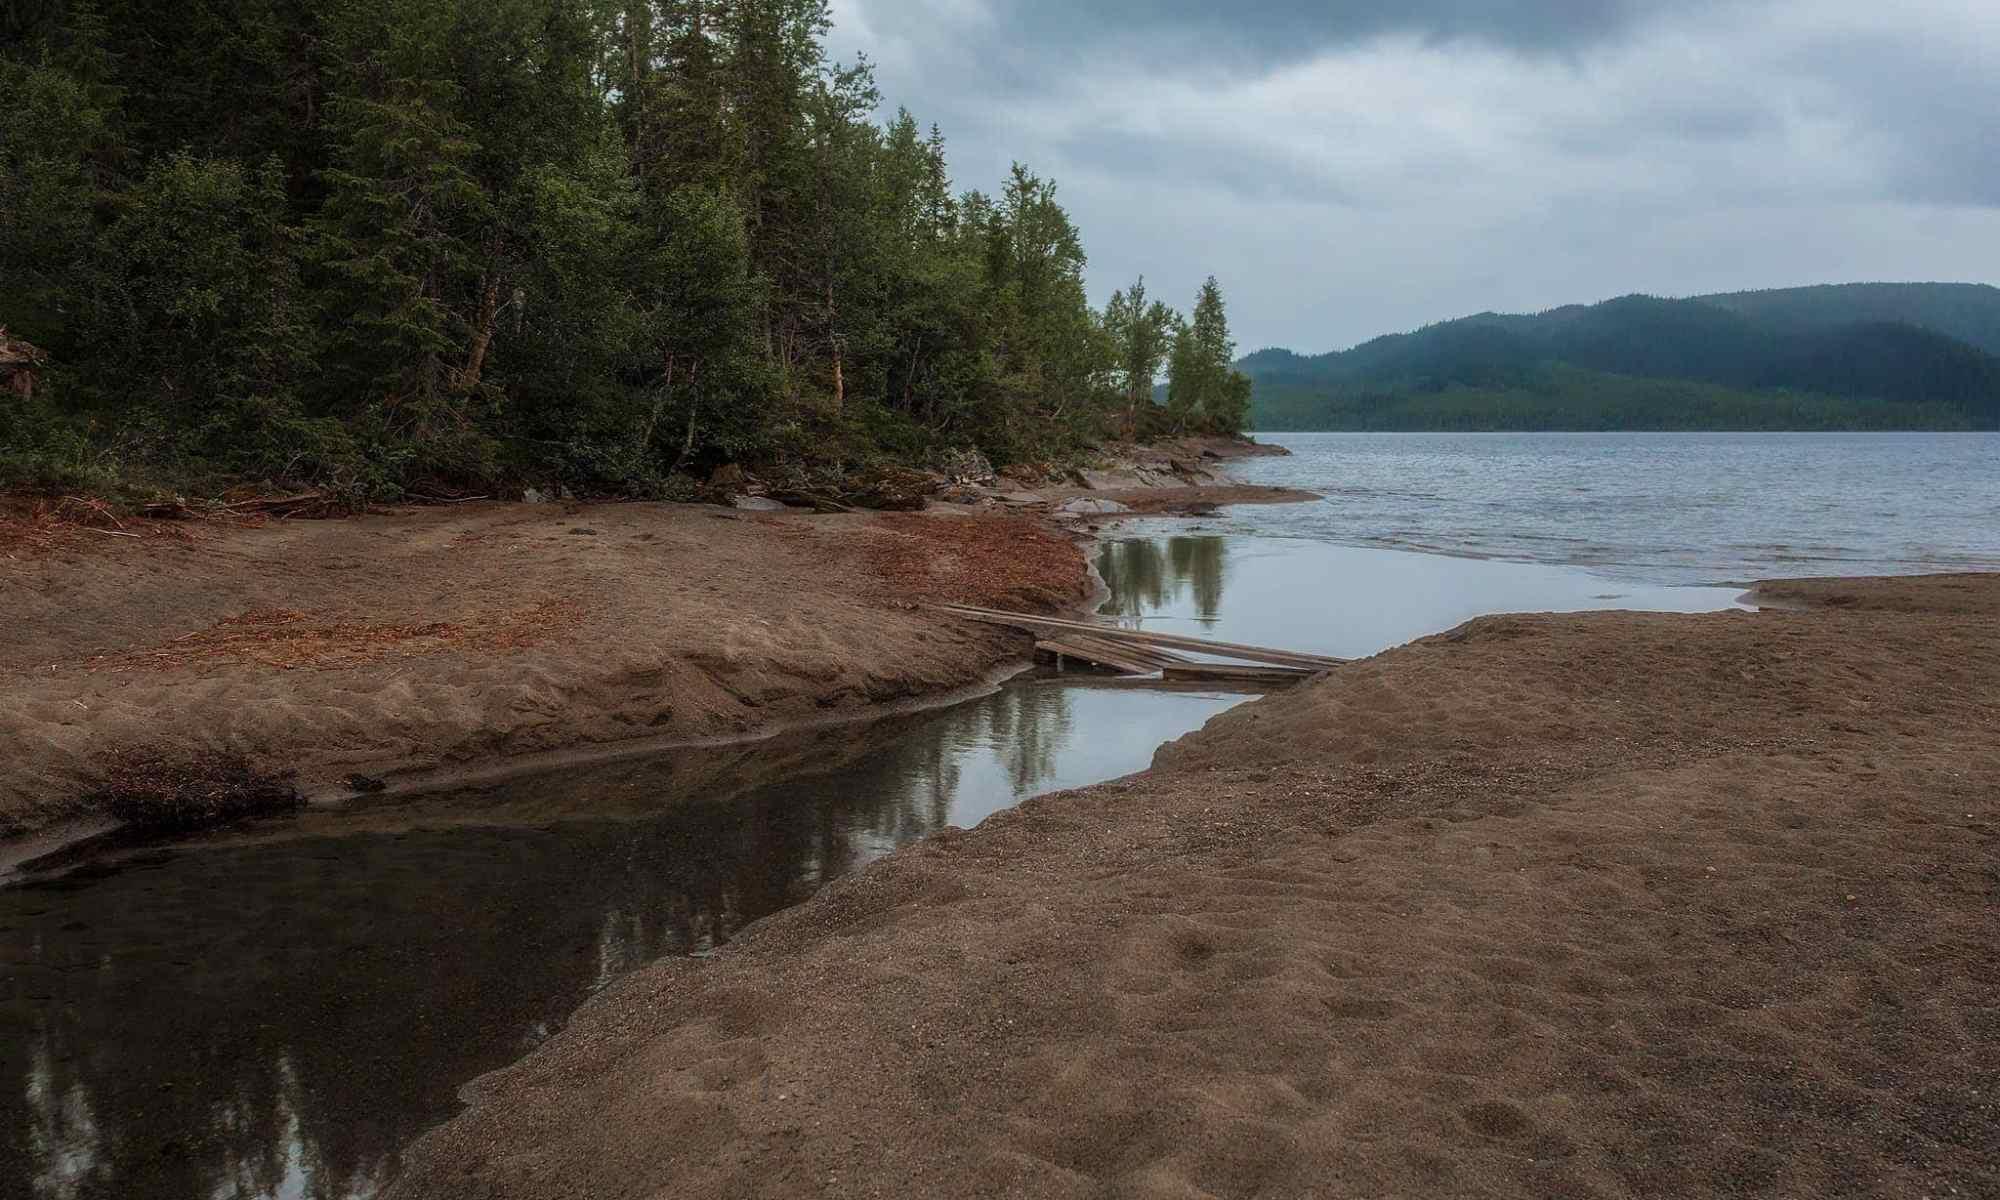 Ankarvattnet innan regnet - Ludwig Sörmlind